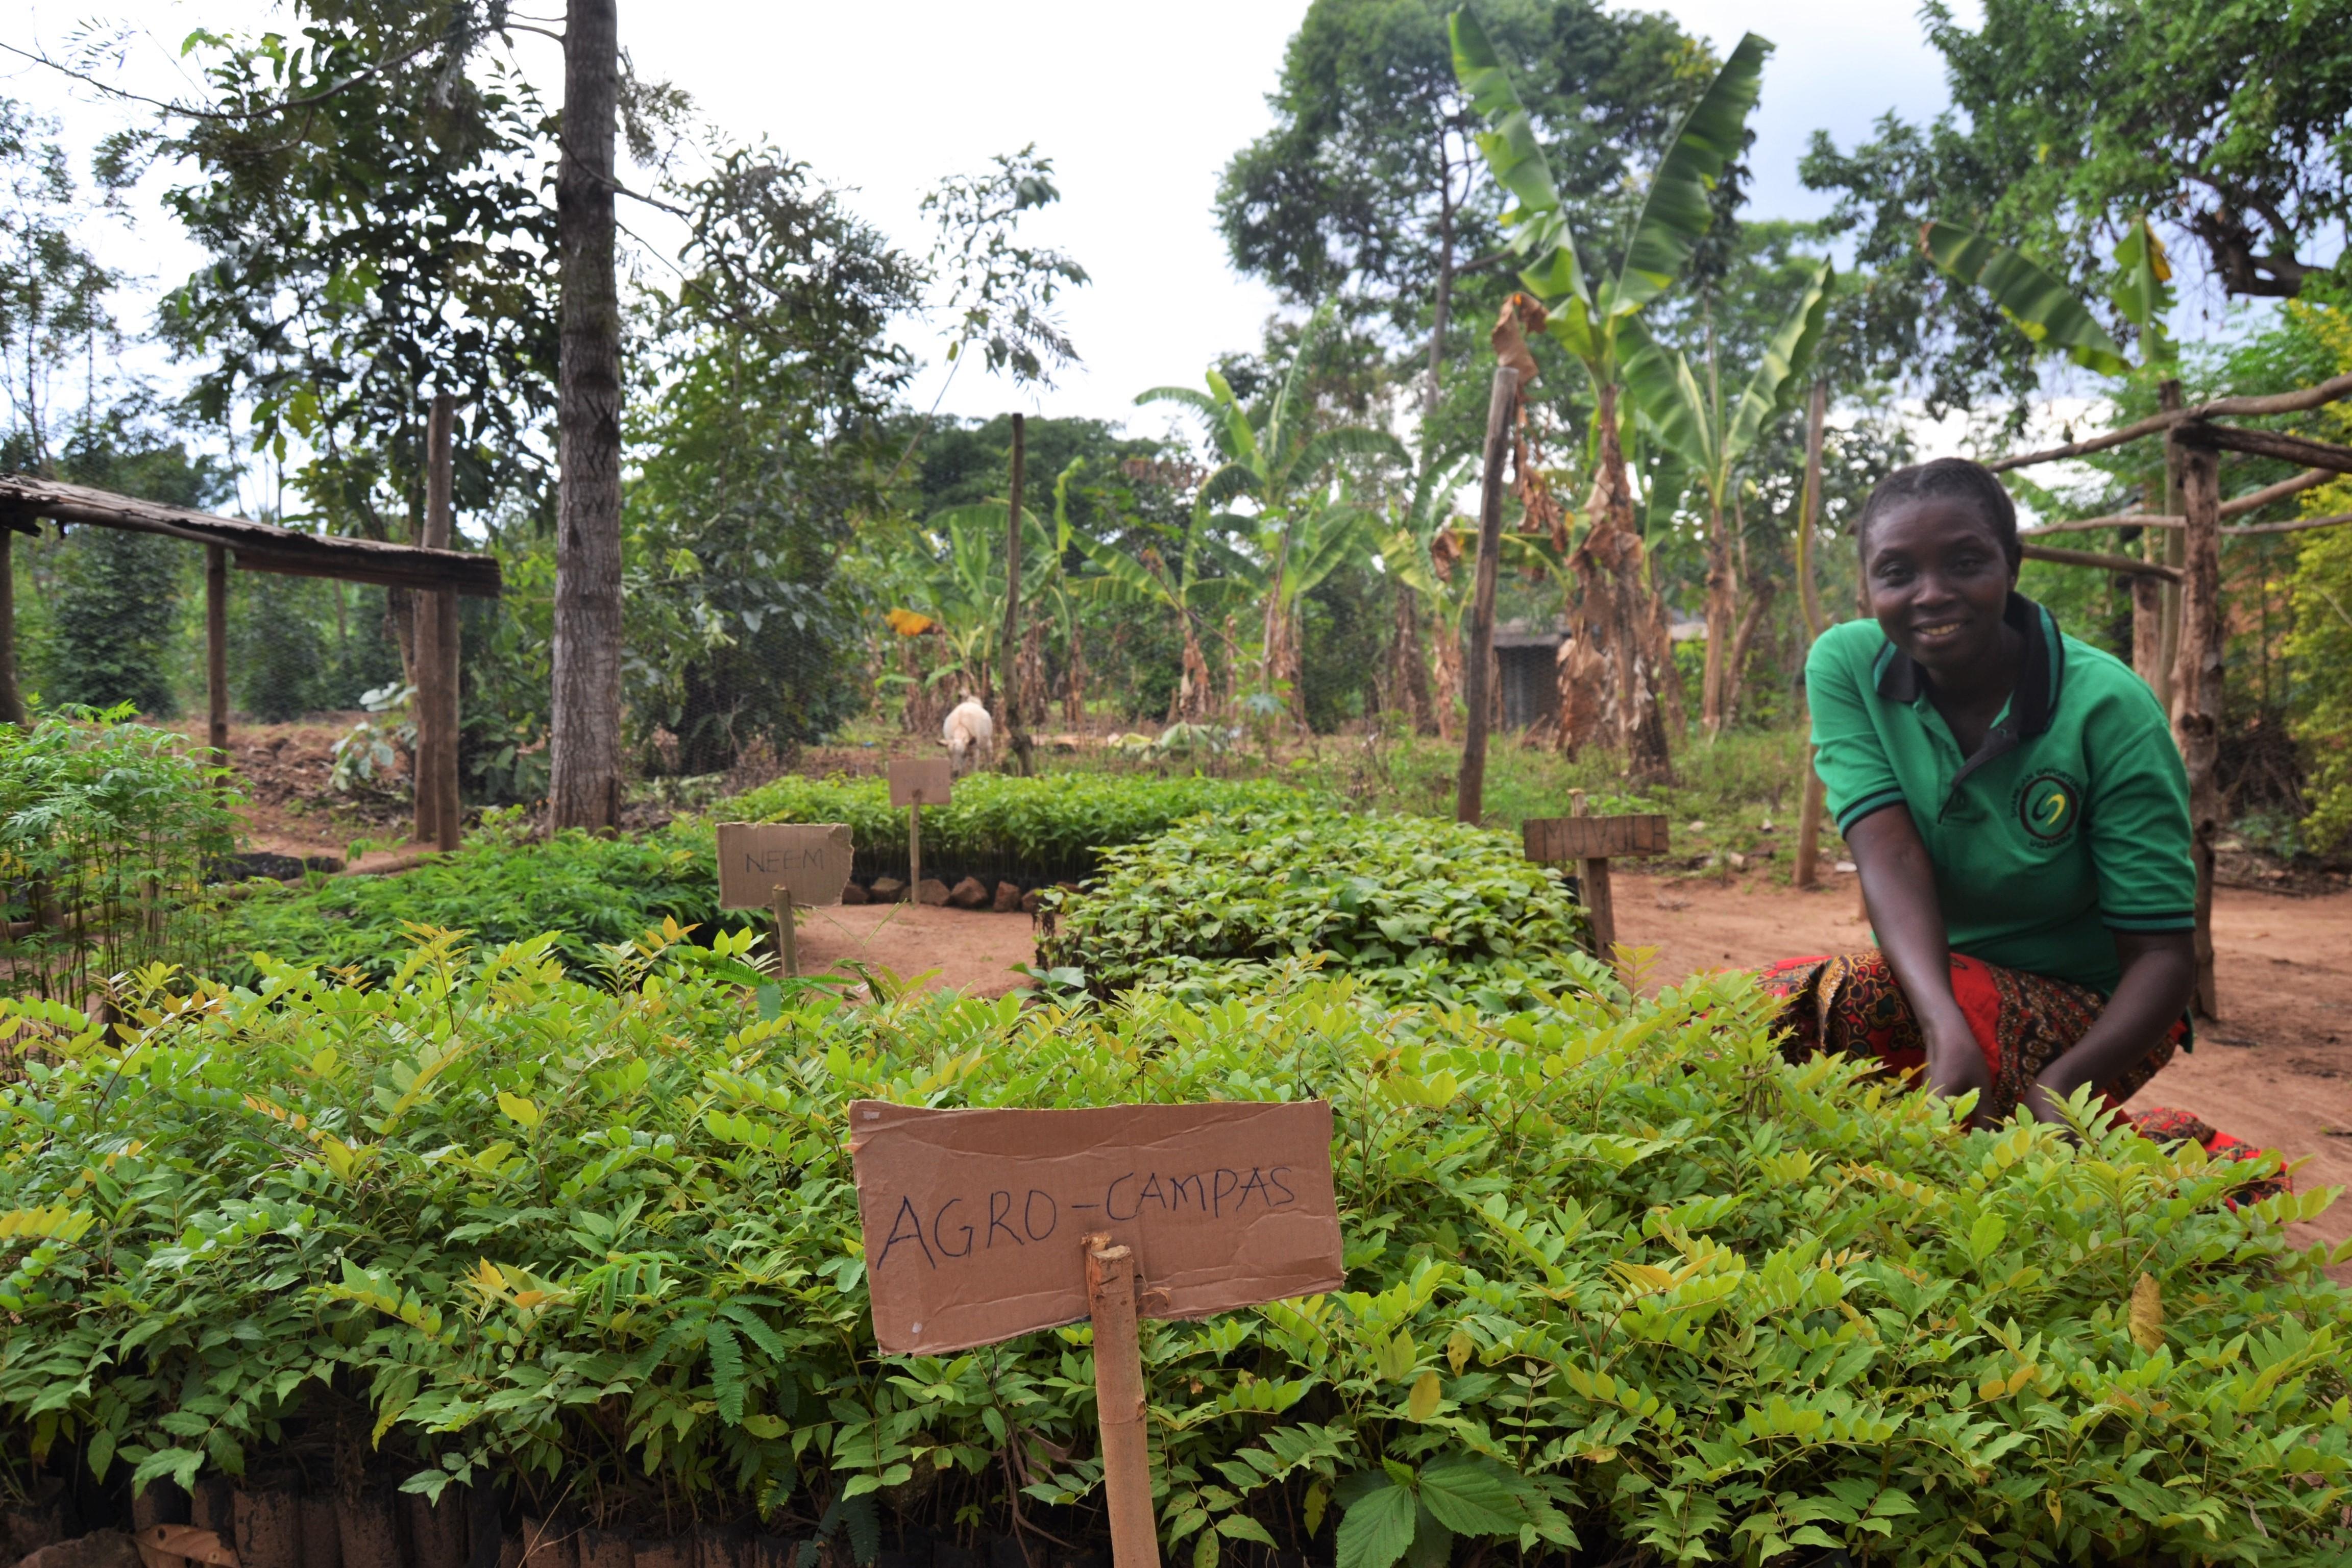 KIGAAGA SUSTAINABILITY SCHOOL SPEARHEADS TREE-PLANTING EFFORTS